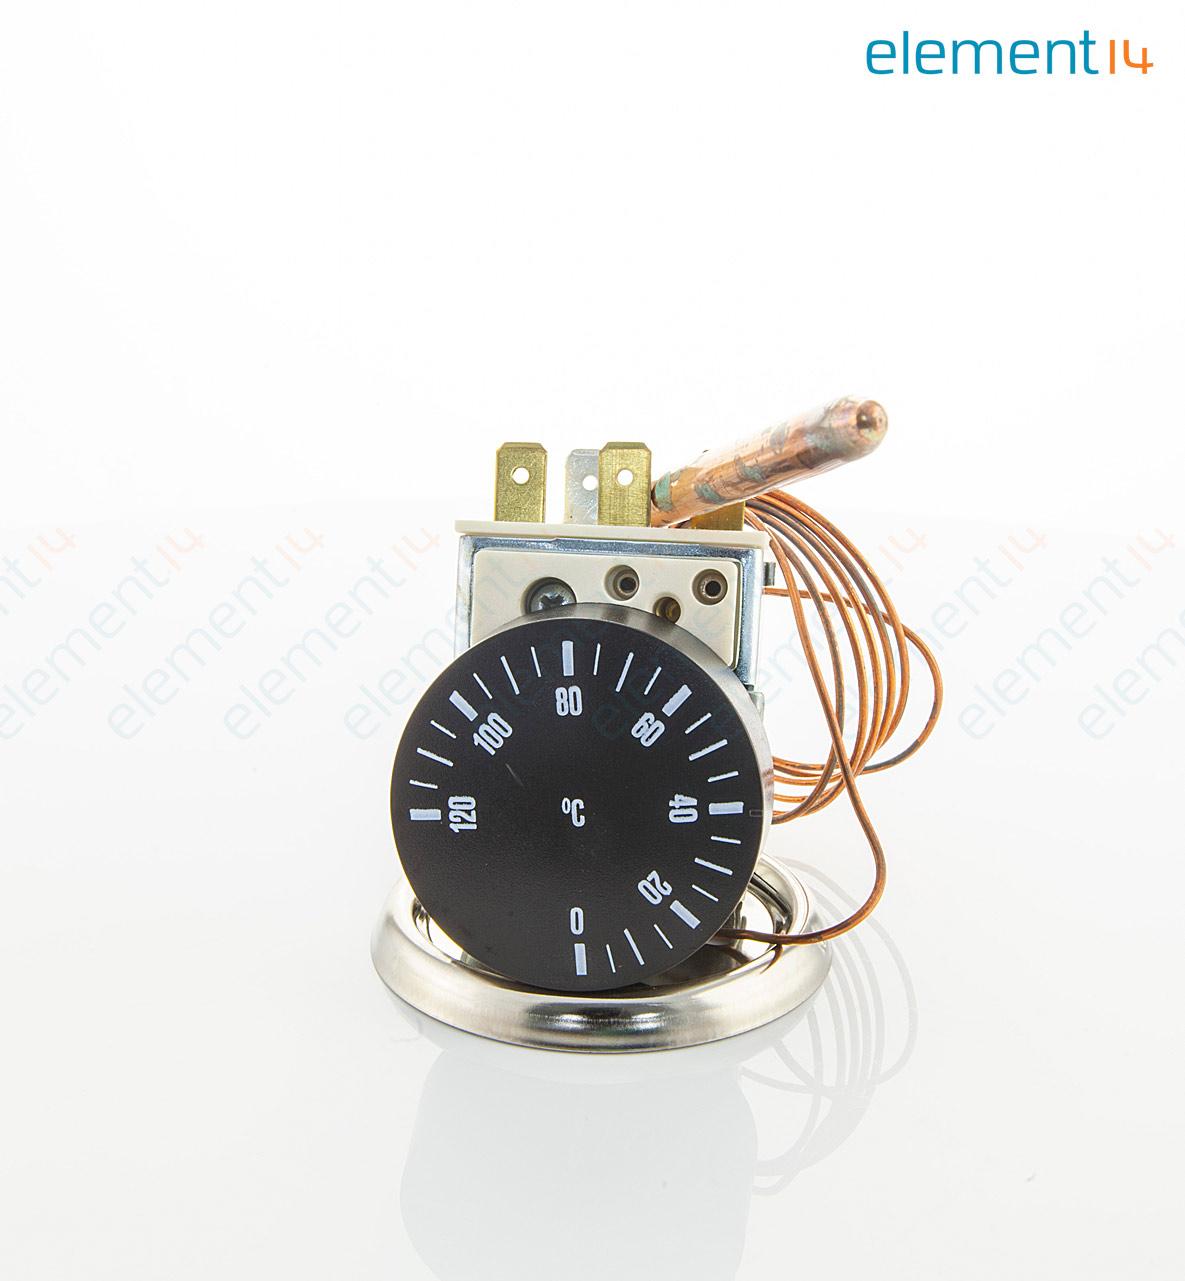 540160  556303  556501 Multicomp  Control Thermostat  0 U00b0c To